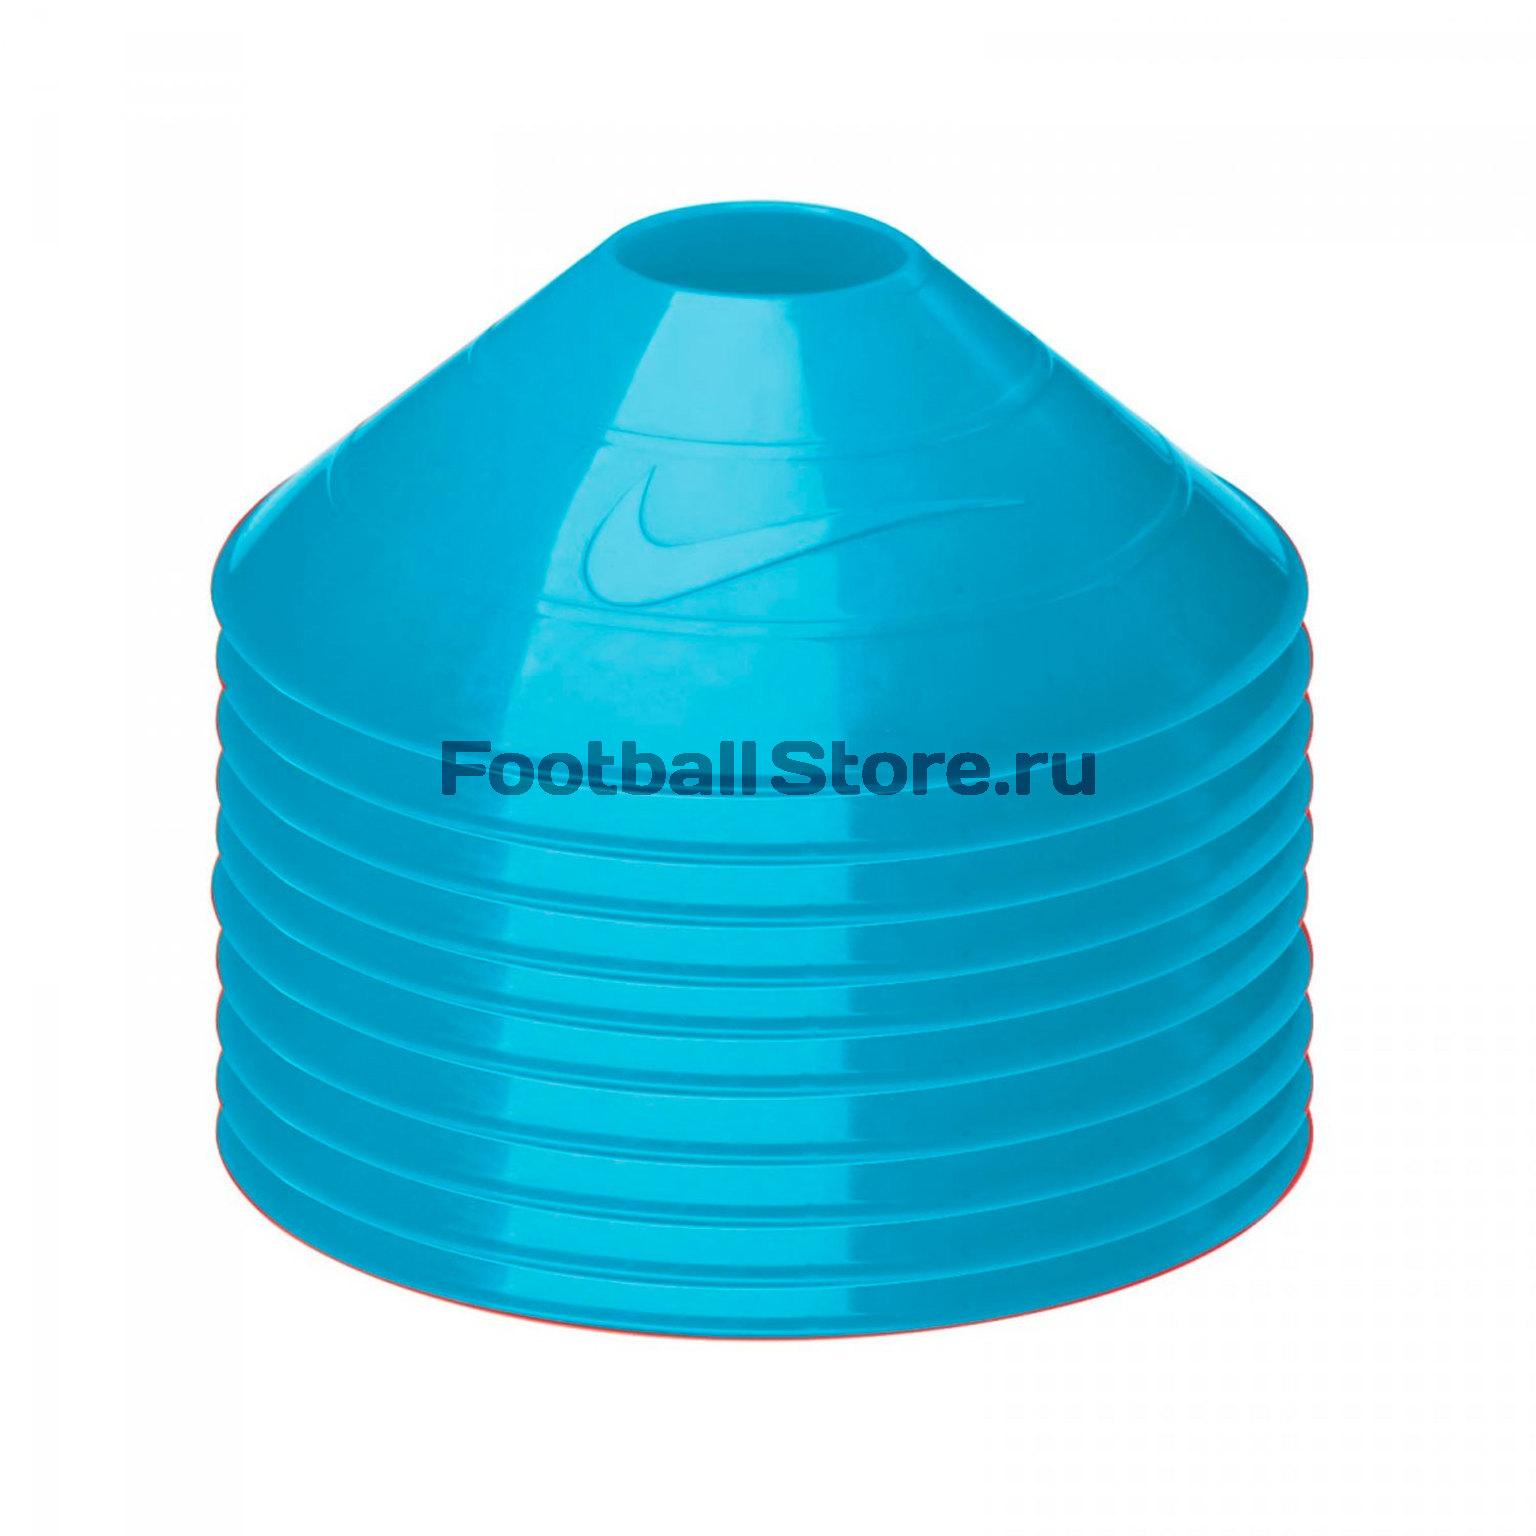 Набор конусов для тренировок Nike 10 Pack Training Cones N.SR.08.494.NS